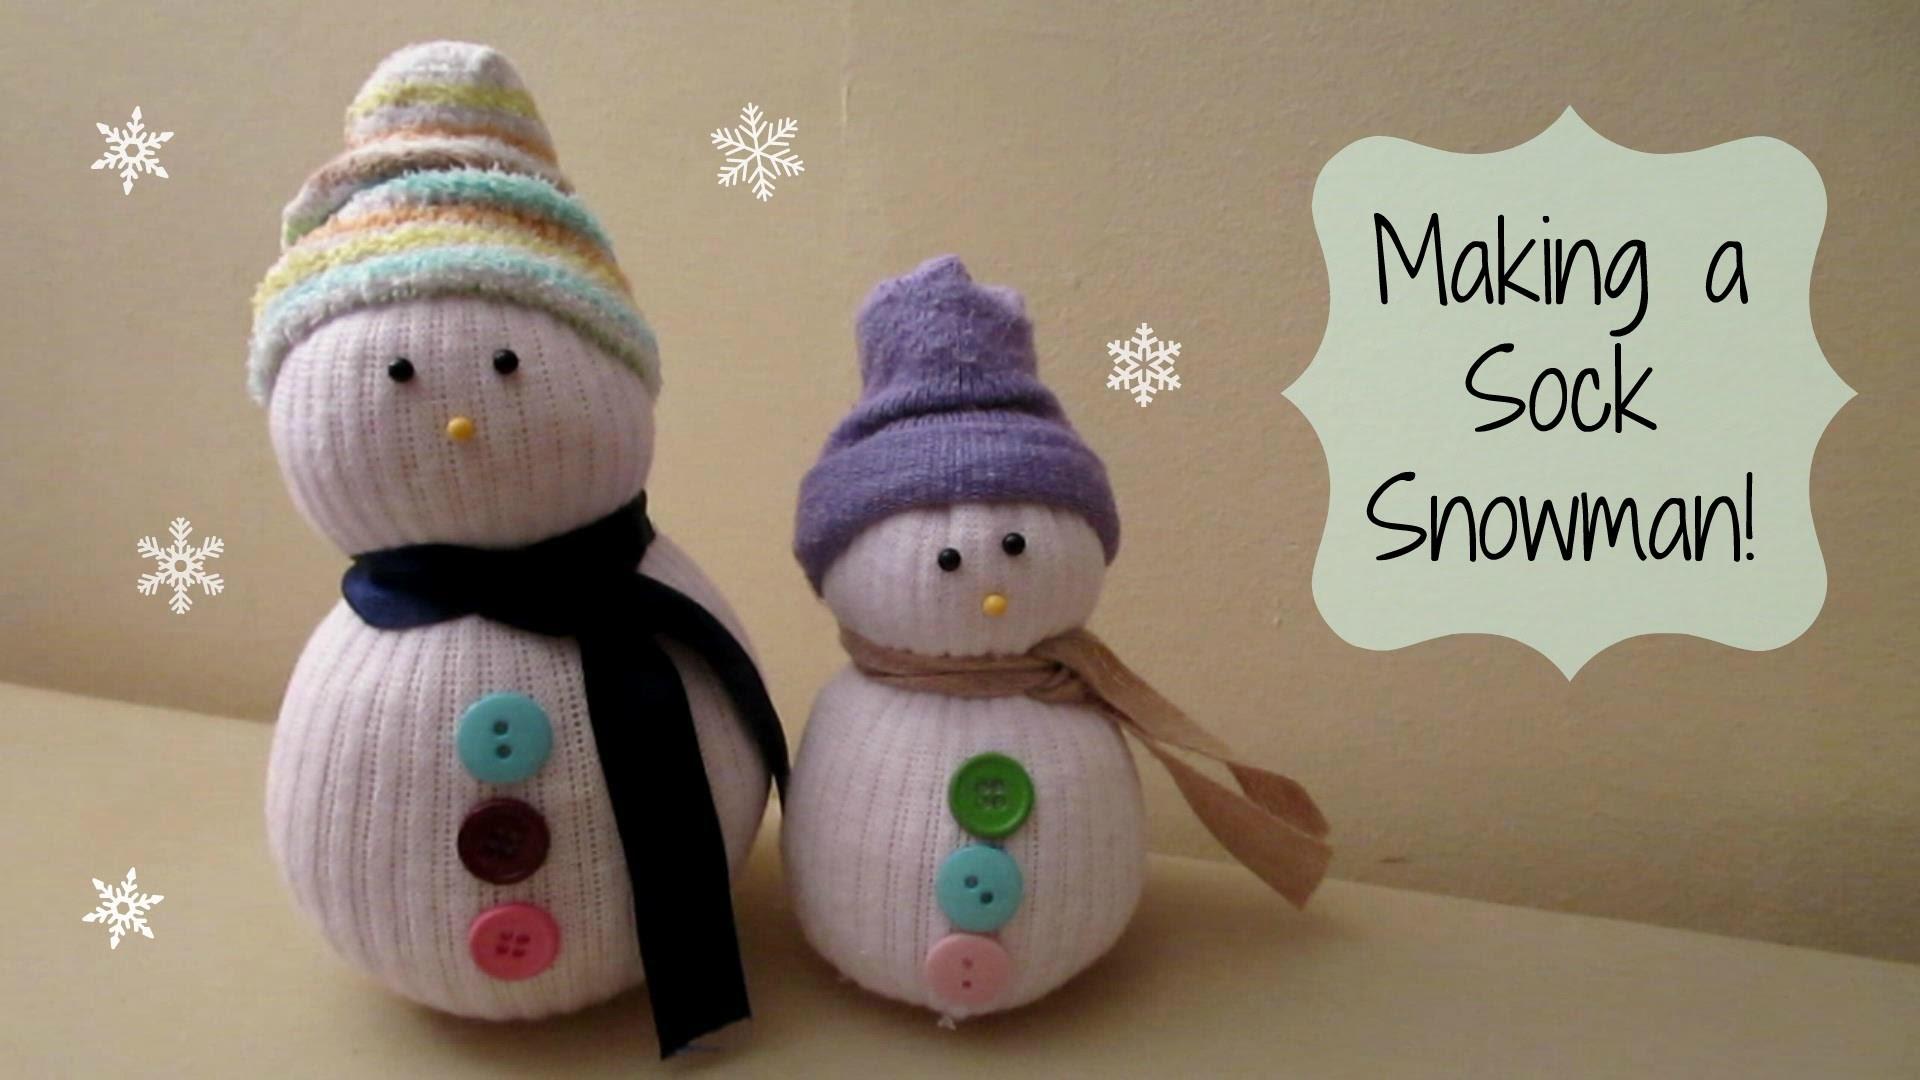 MAKING A SOCK SNOWMAN! Cute Winter Craft | MayMommy2011